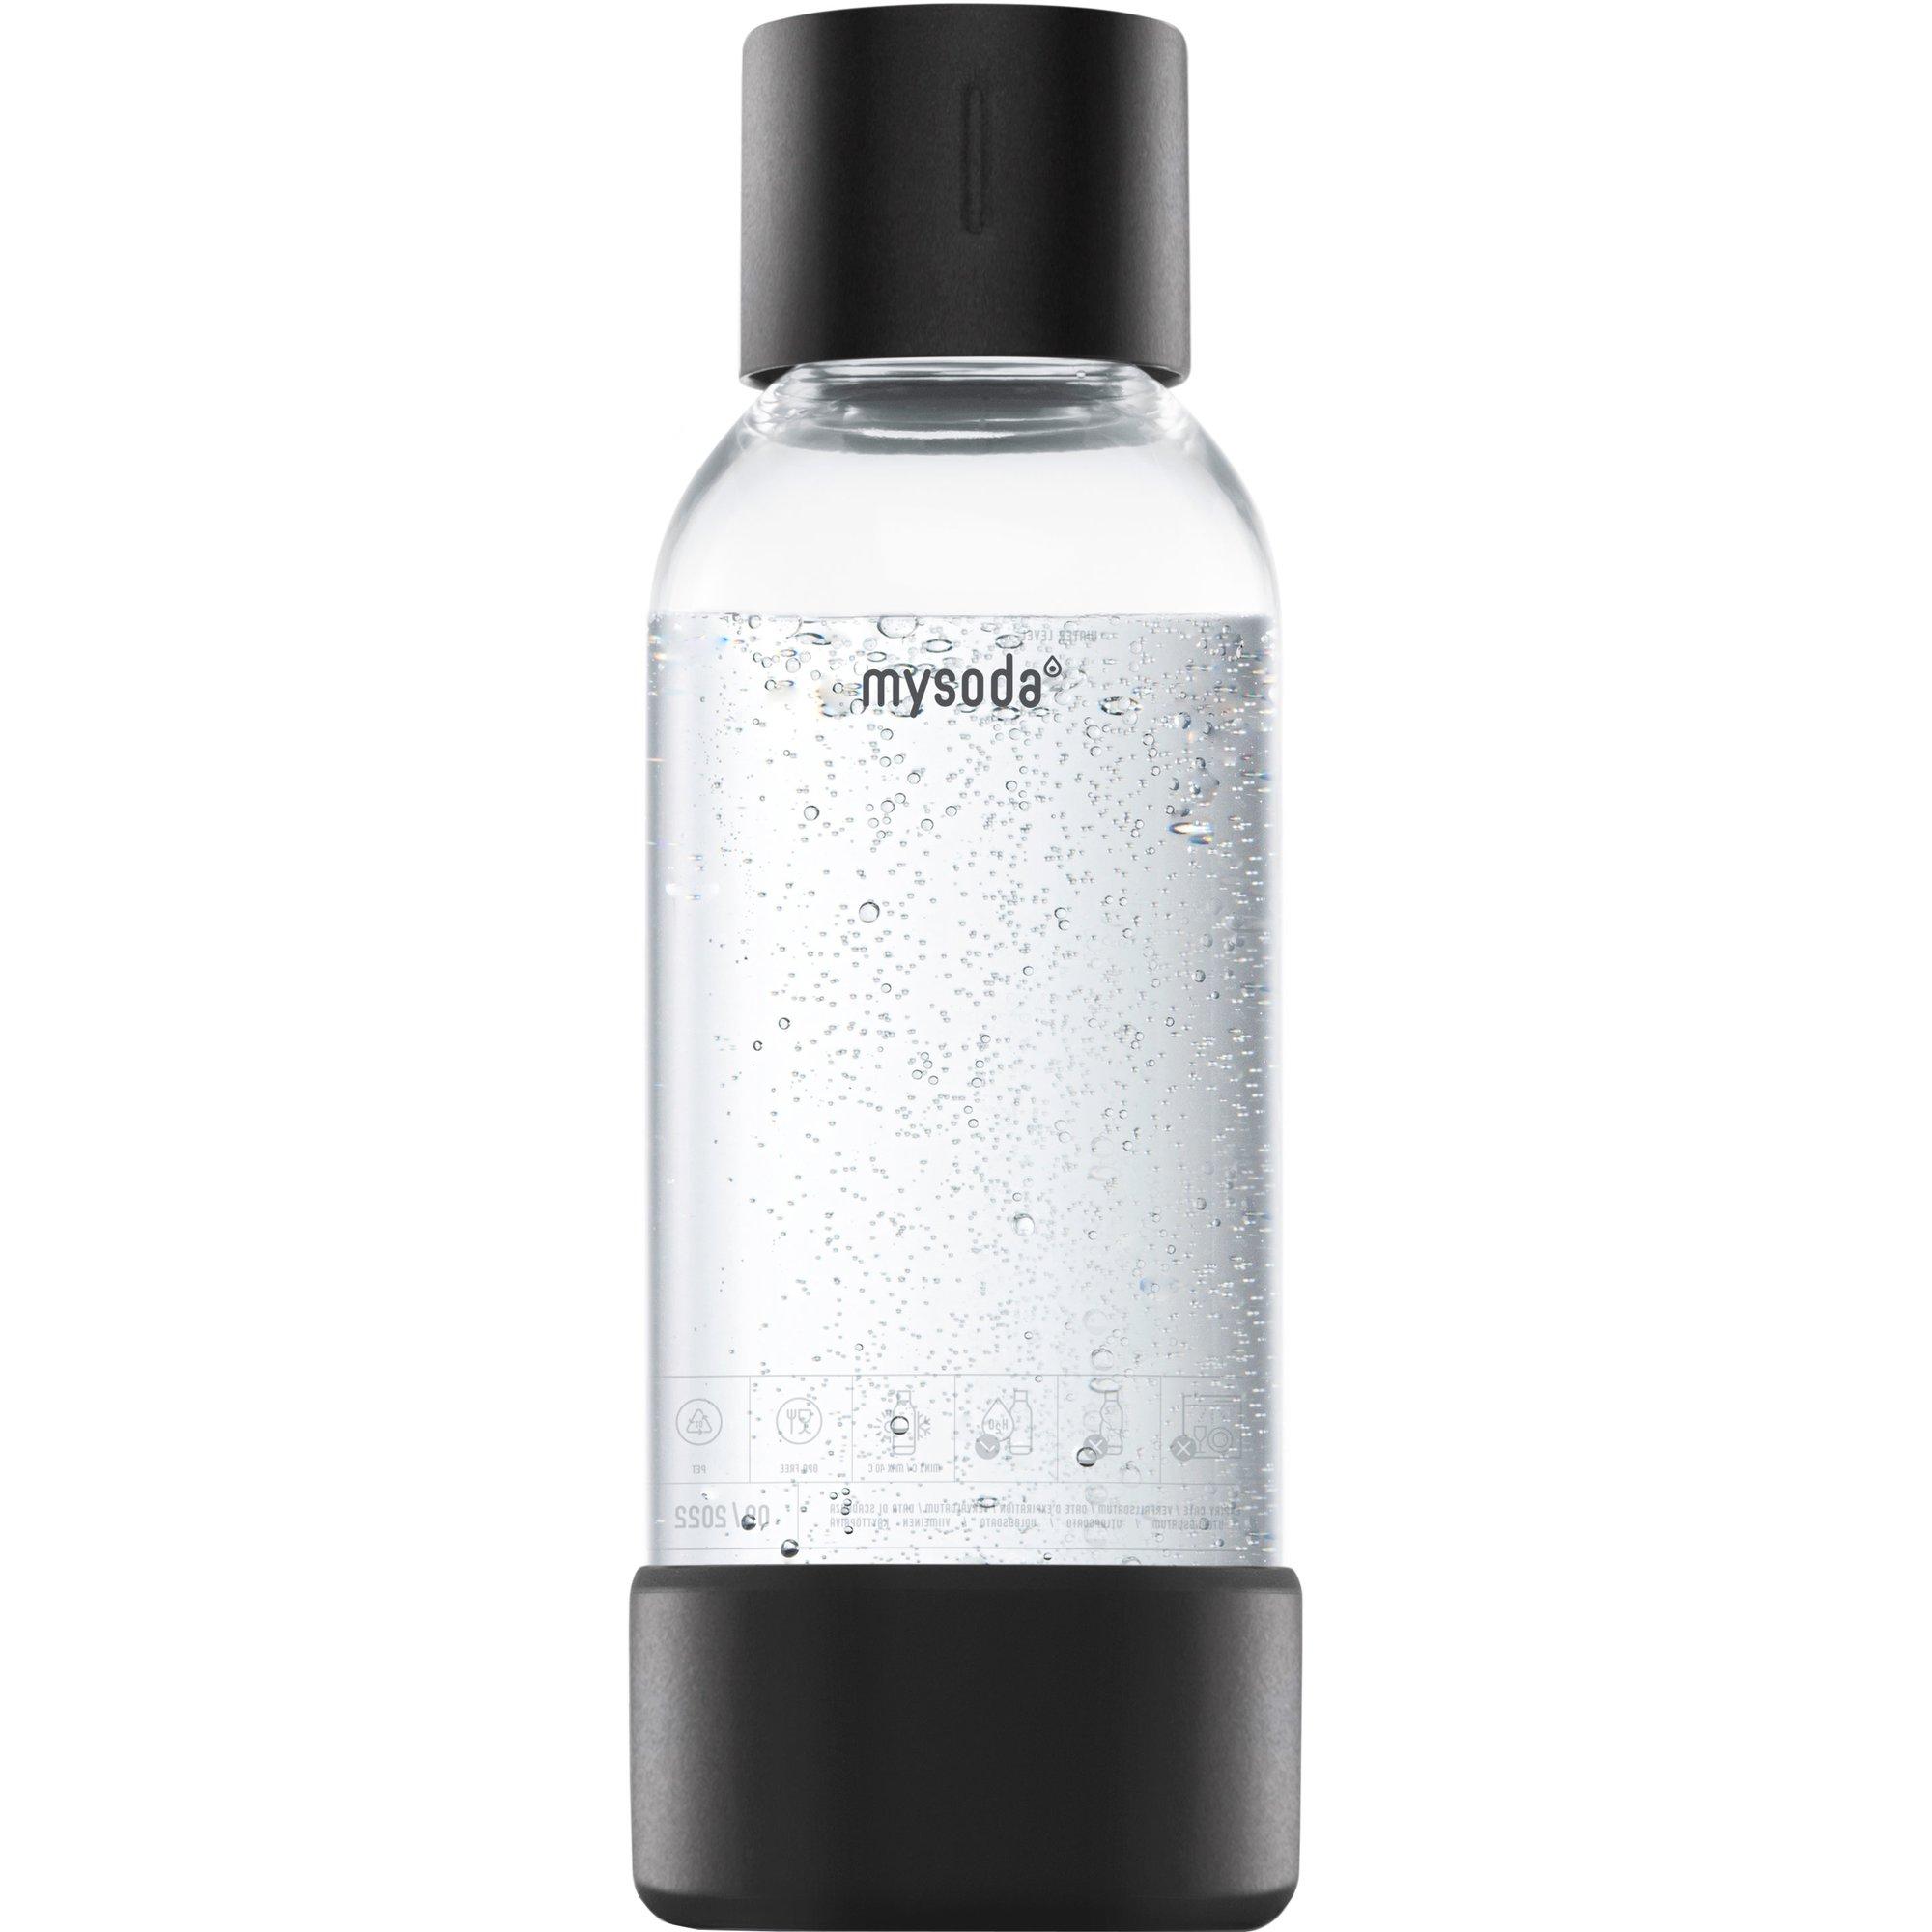 MySoda Vattenflaska 05 liter Svart